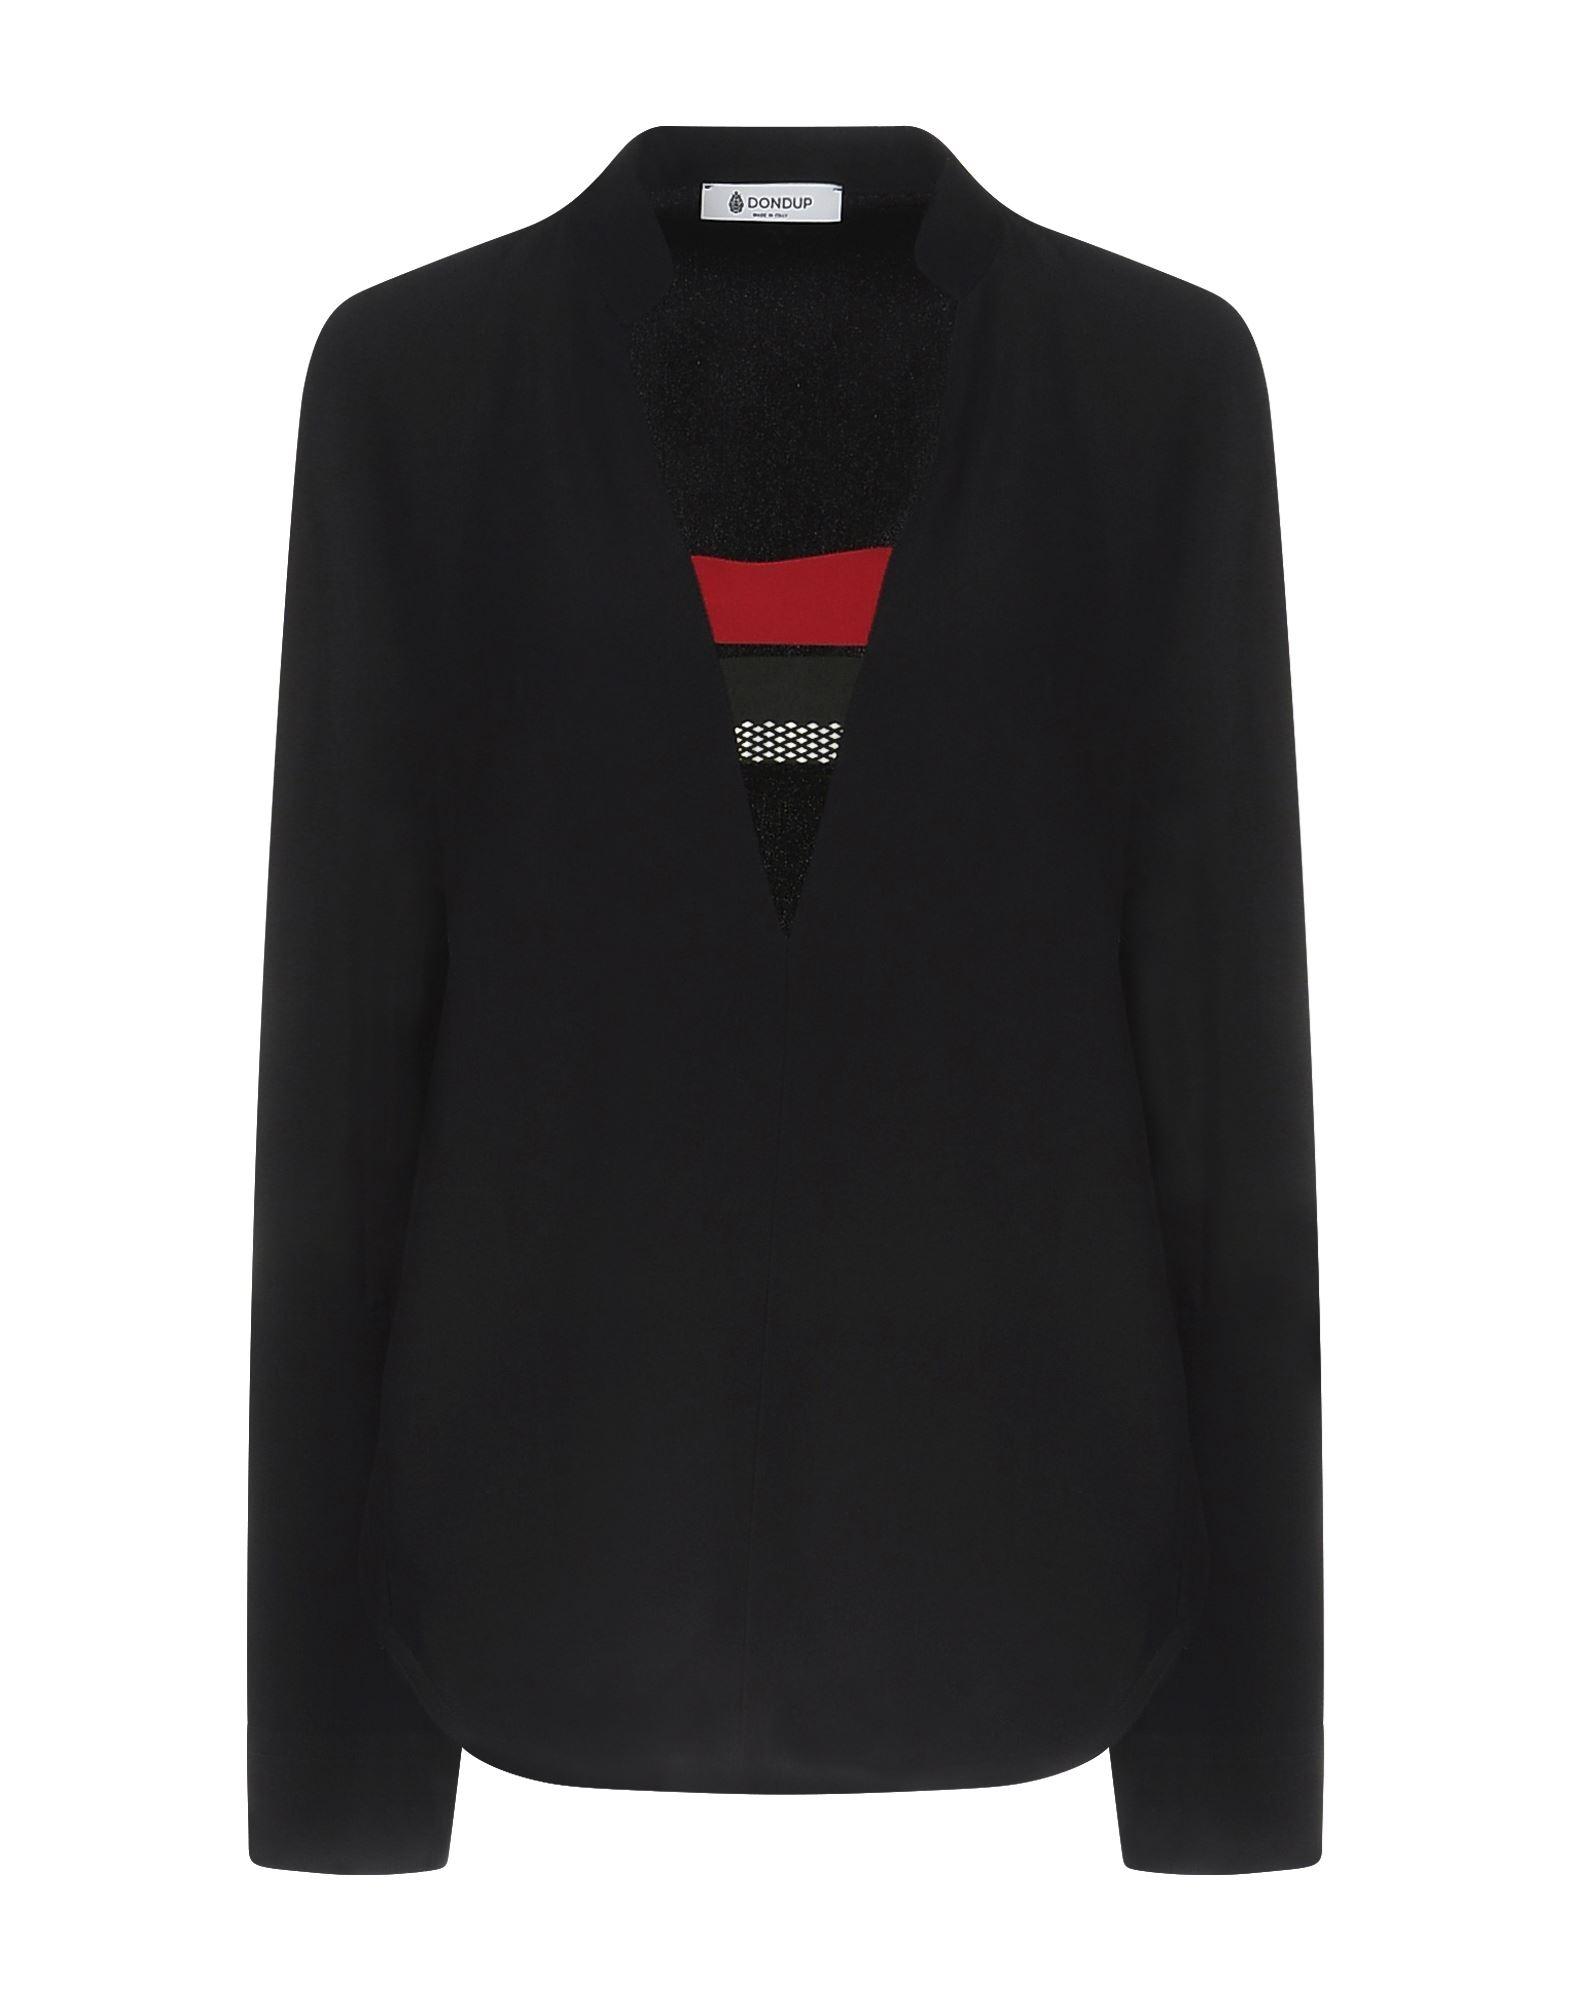 DONDUP Blouses. cady, no appliqués, solid color, v-neckline, long sleeves, no pockets. 50% Acetate, 50% Viscose